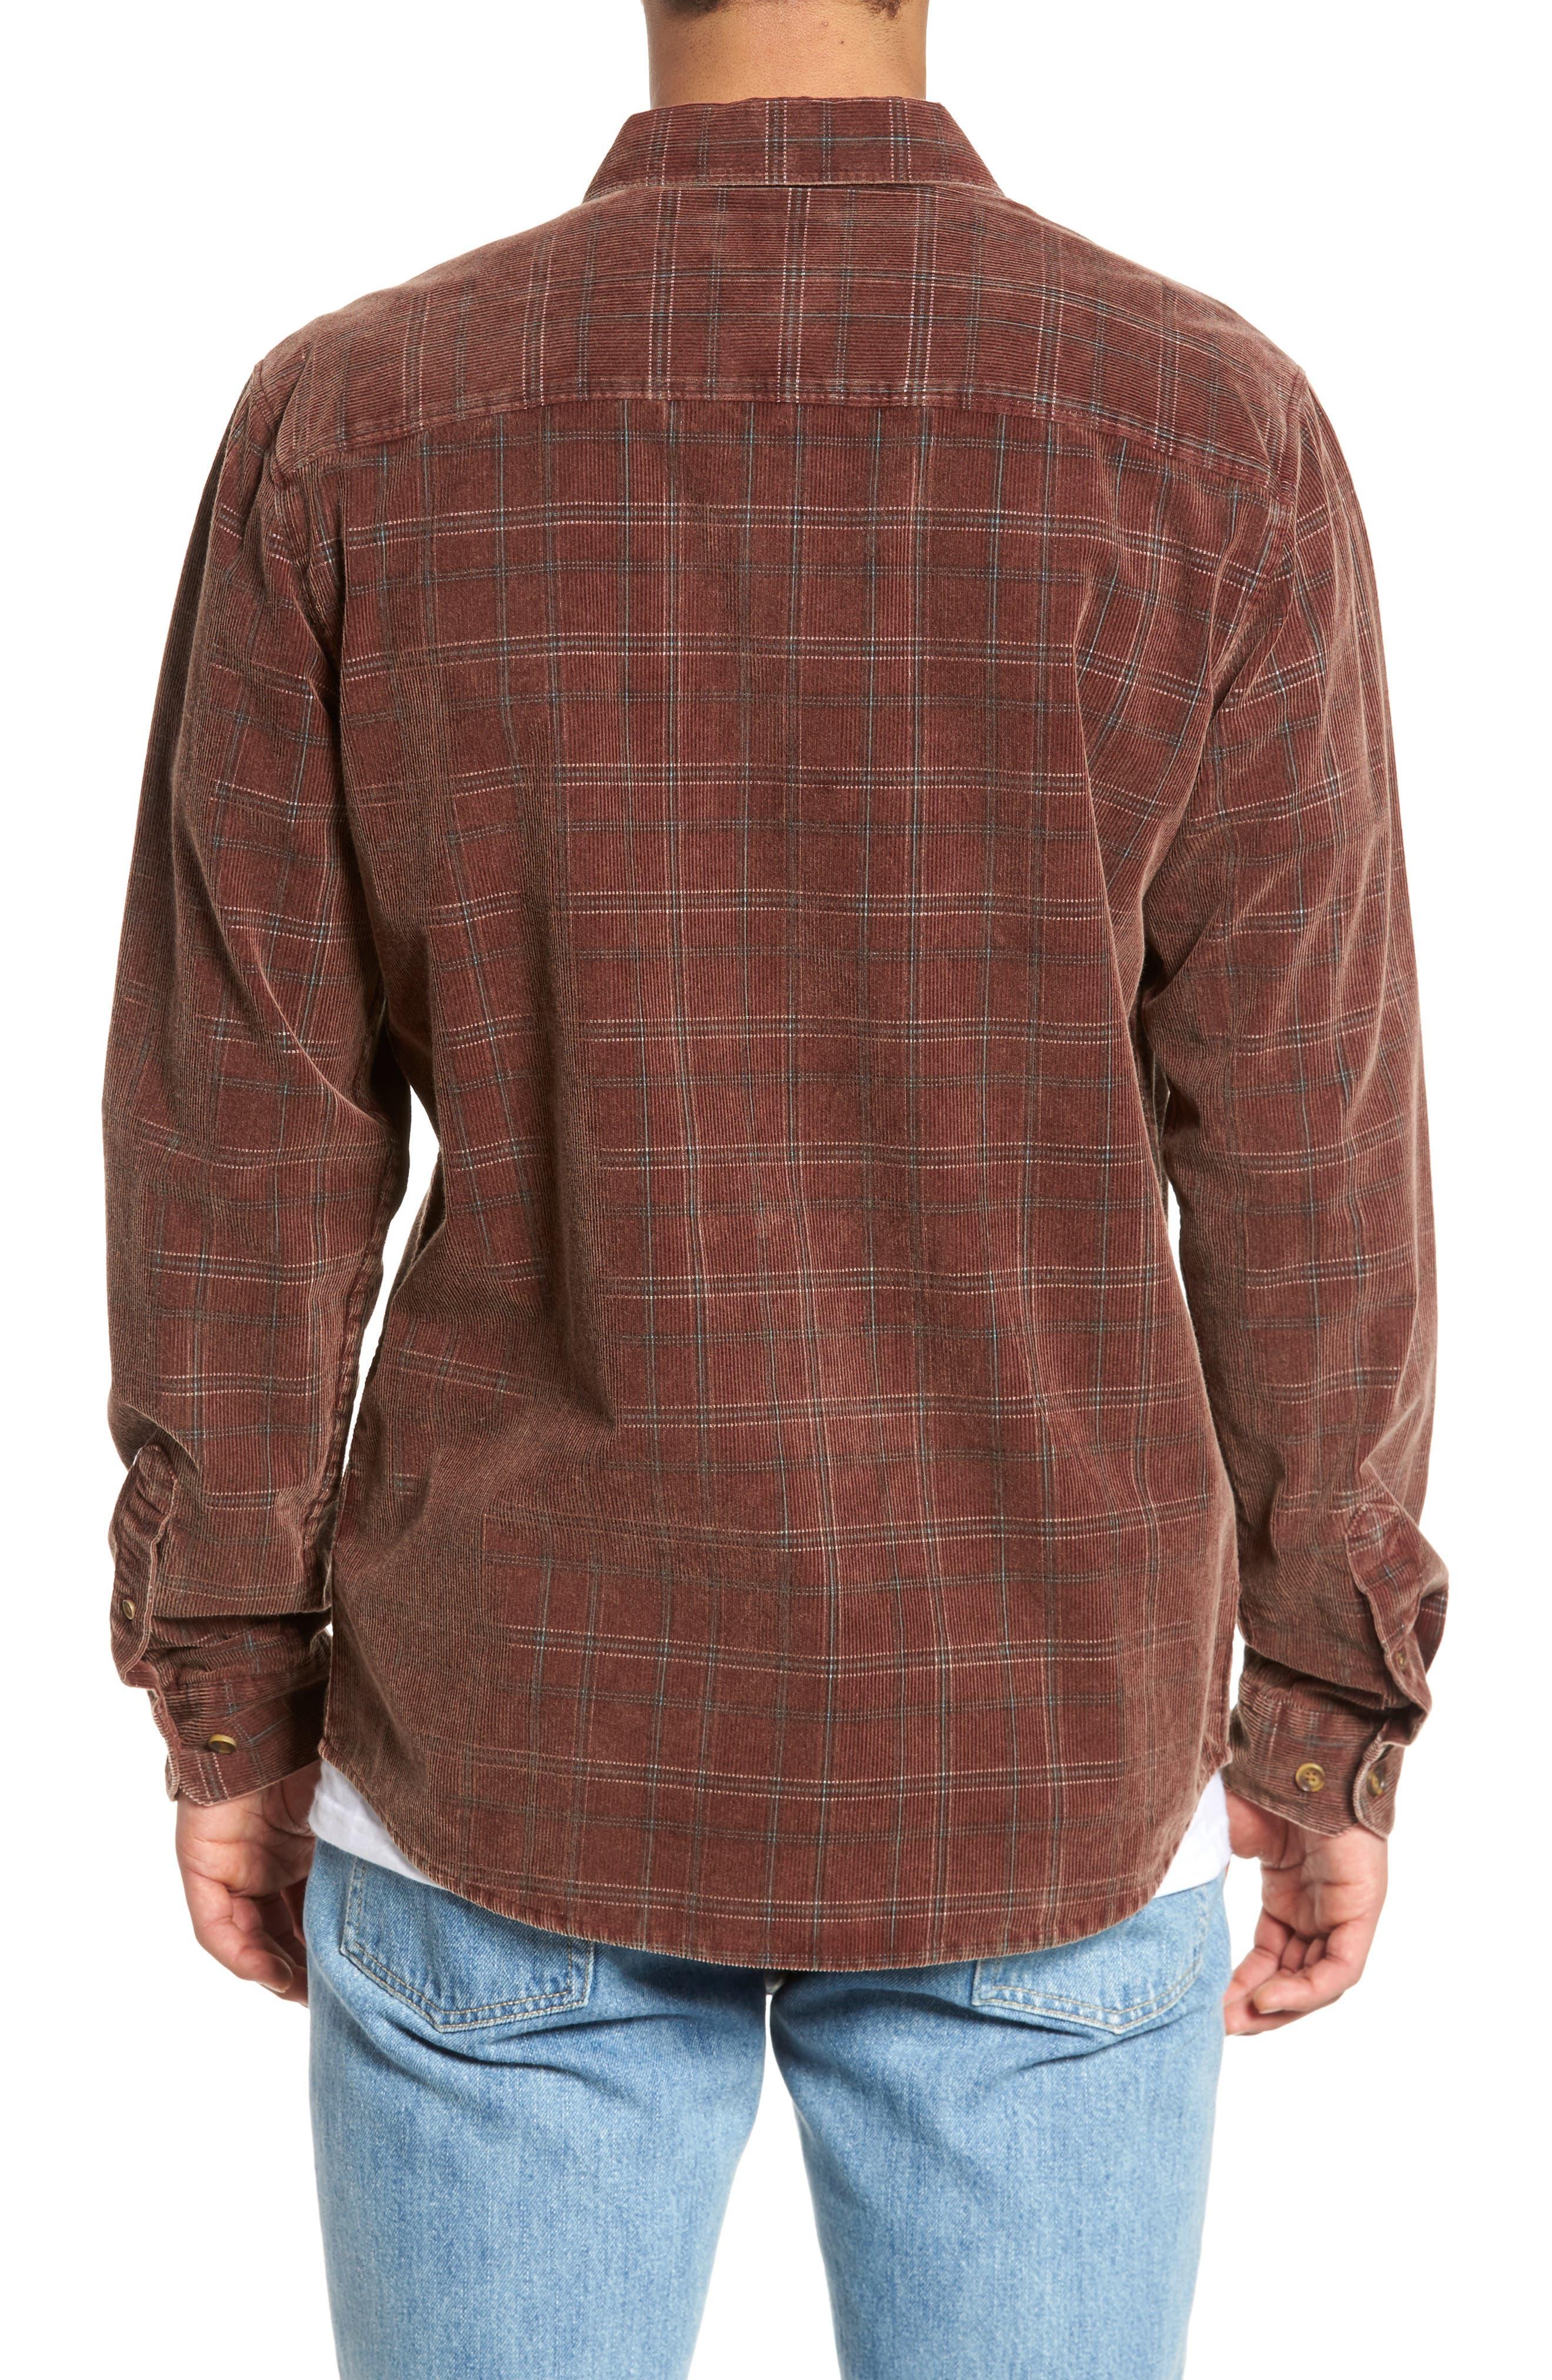 Bradley Corduroy Shirt,                             Alternate thumbnail 2, color,                             Burgundy